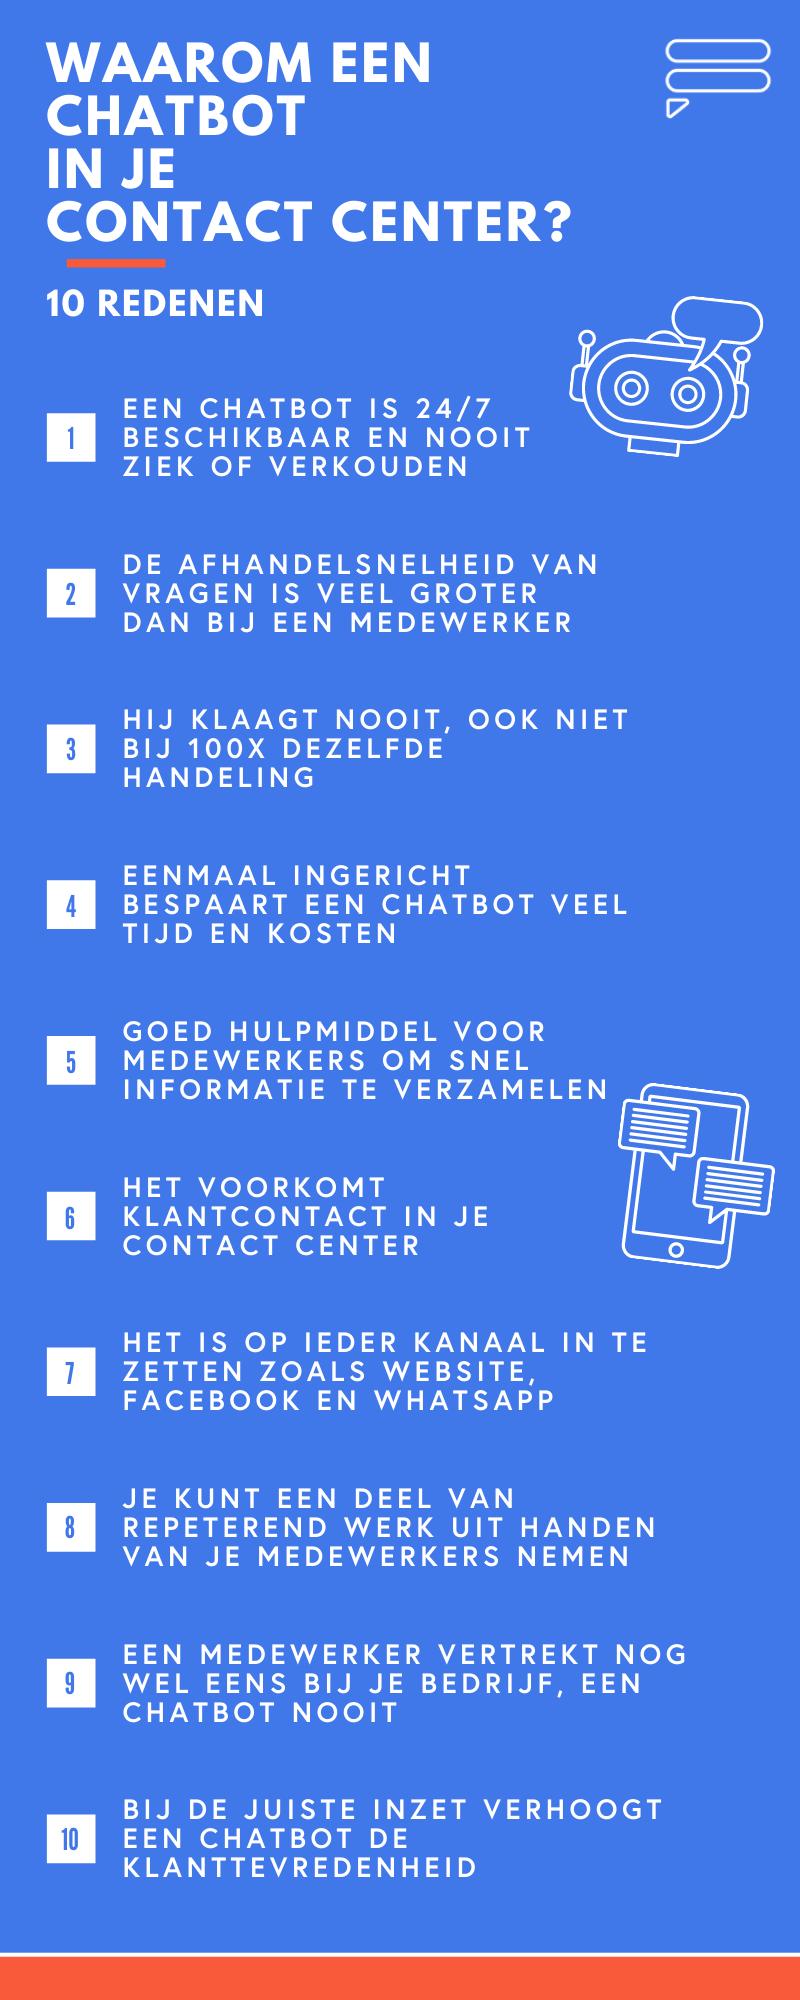 chatbot-contact-center-10-redenen-infographic